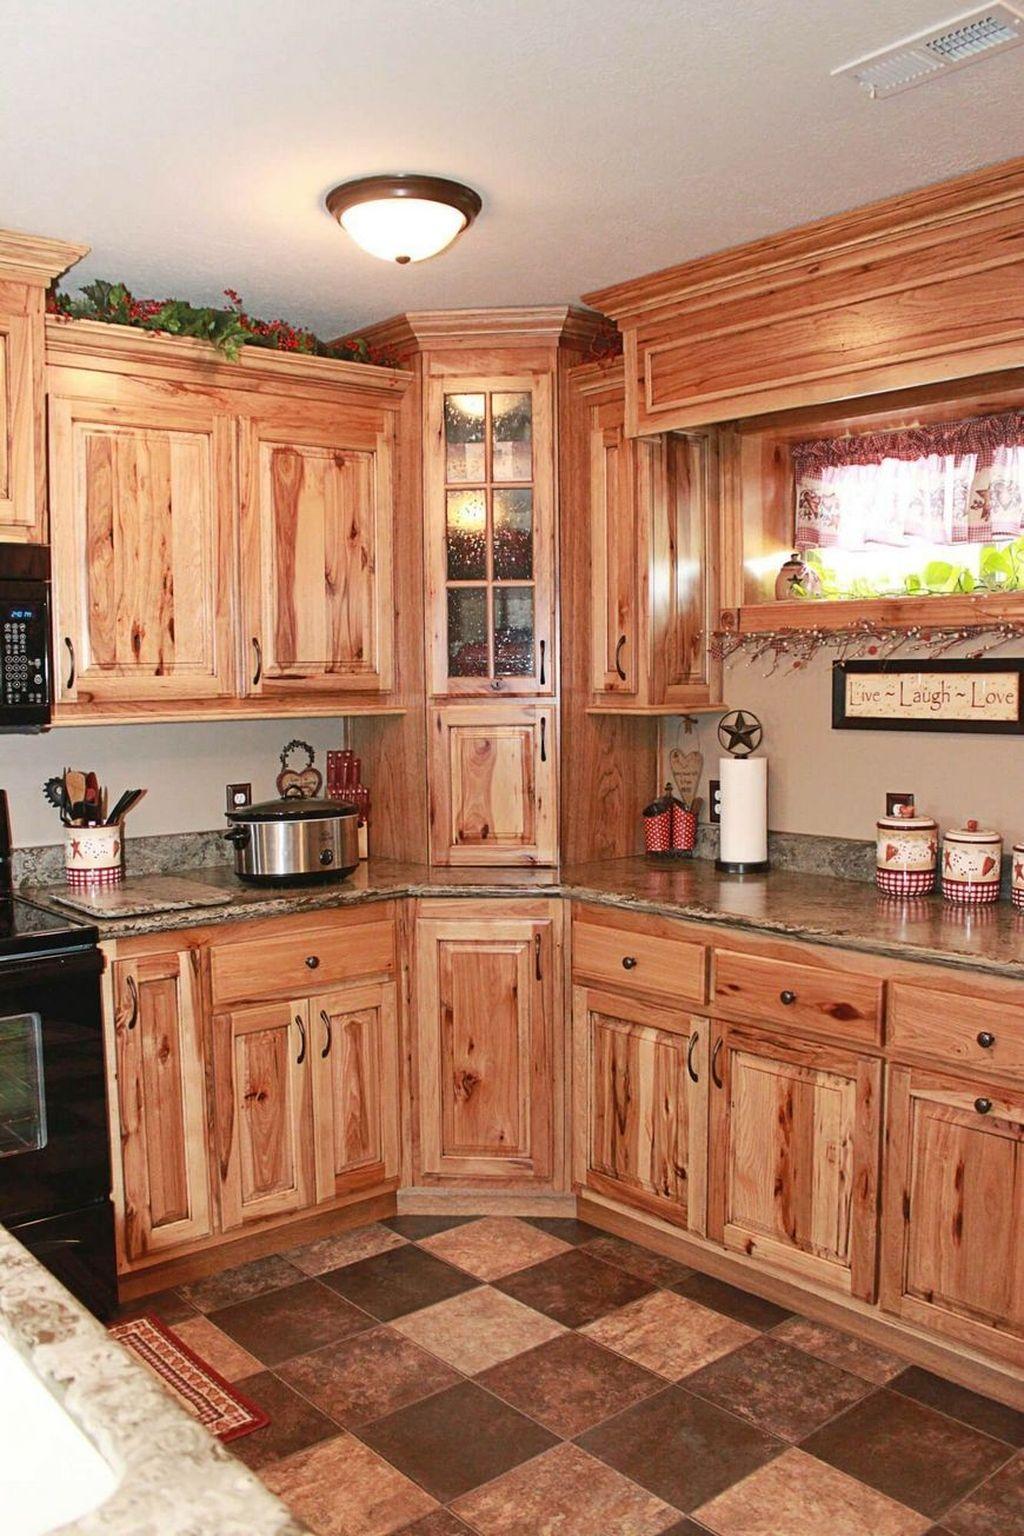 Nice Rustic Farmhouse Kitchen Cabinets Design Ideas 06 ...